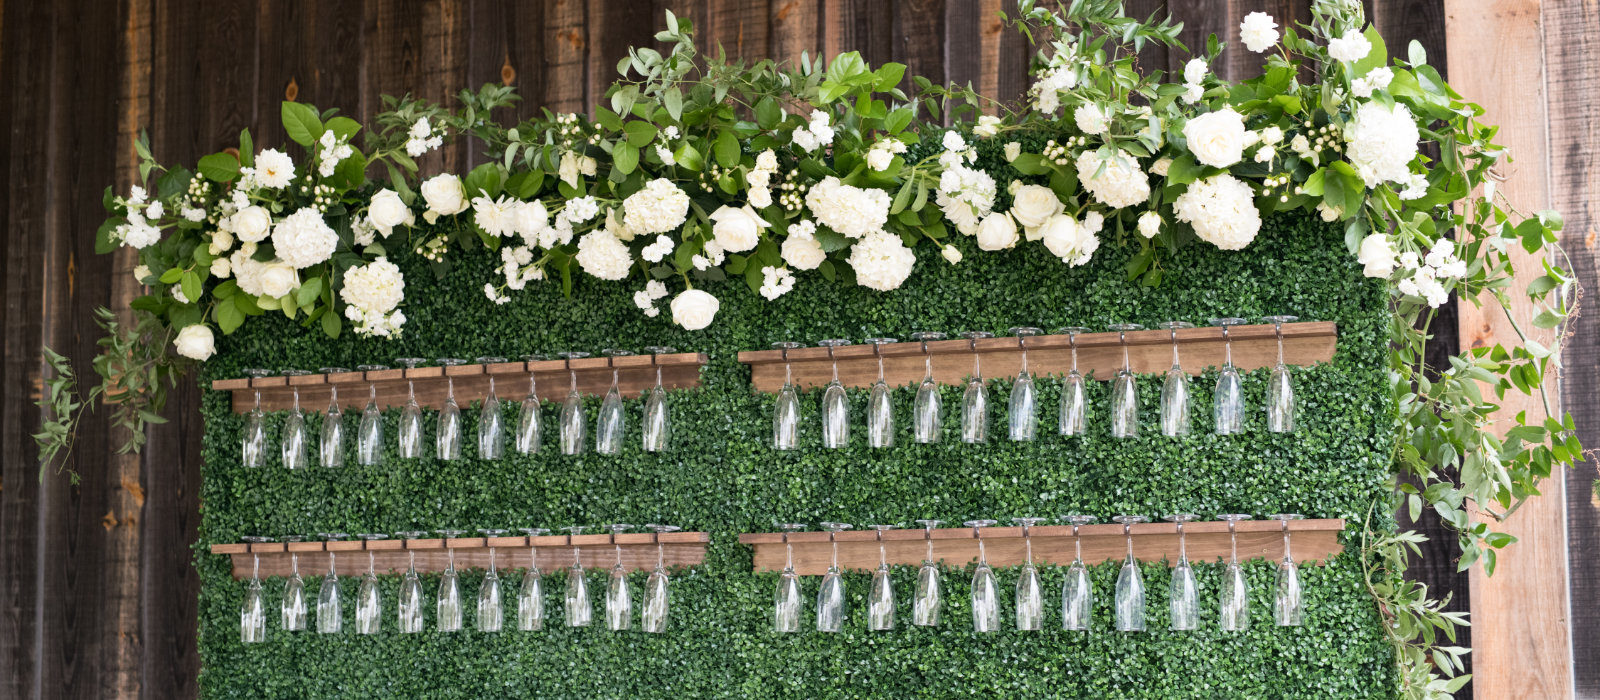 LindseyHinkleyphotography-champagne-glasses-hanging